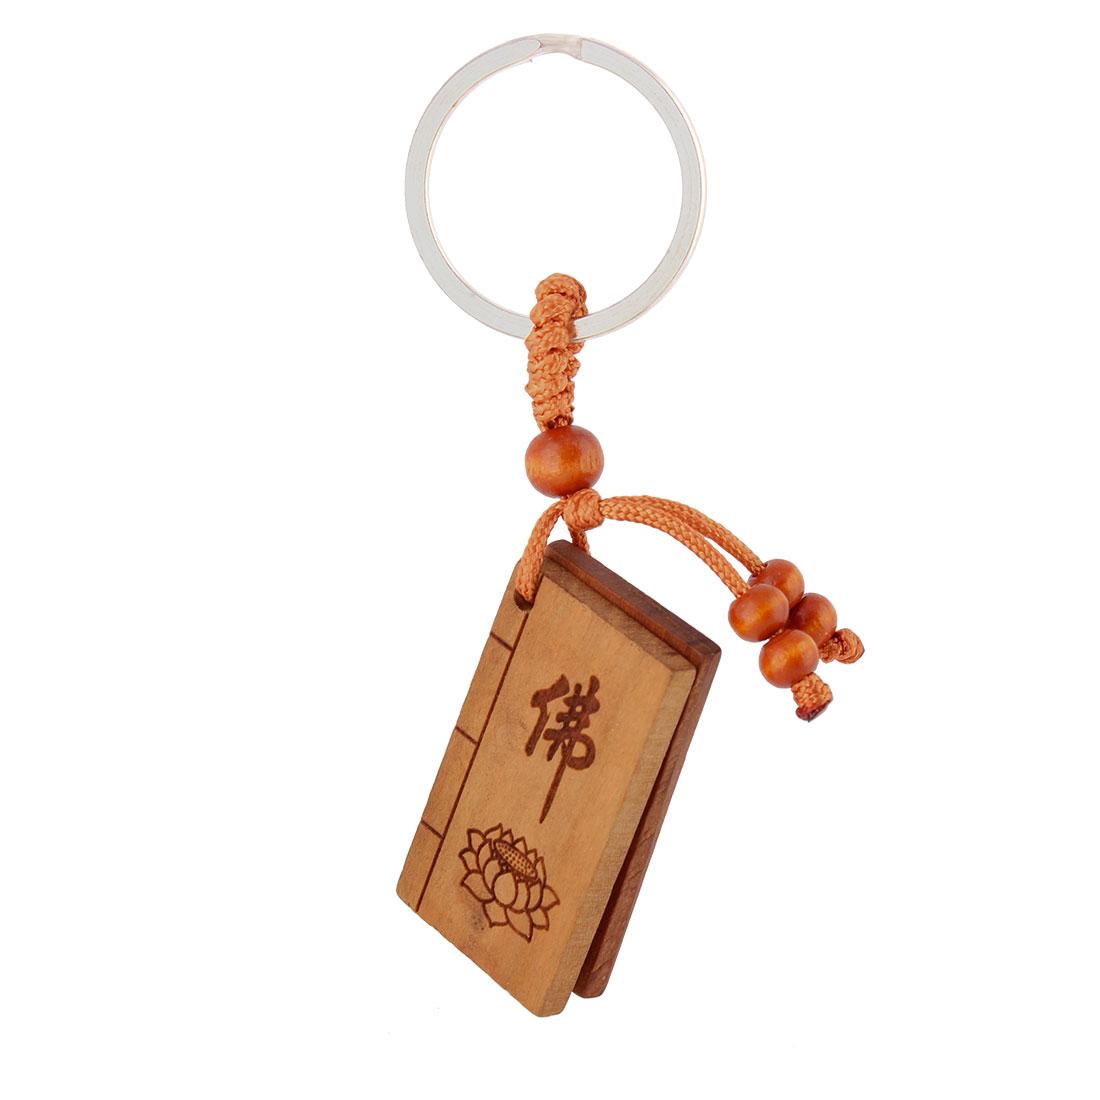 Wooden Rectangle Shaped Pendant Split Ring Keyring Handbag Ornament Brown